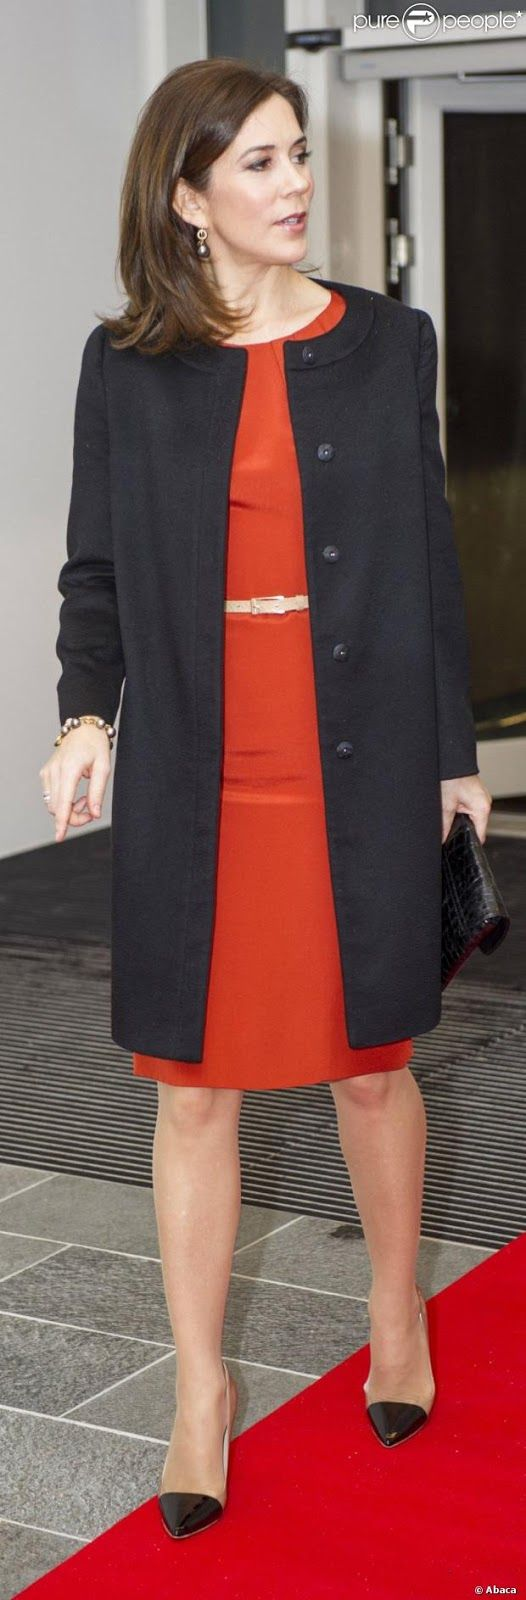 Crown Princess Mary of Denmark coat and dress similar length #21StepsStyleCourse